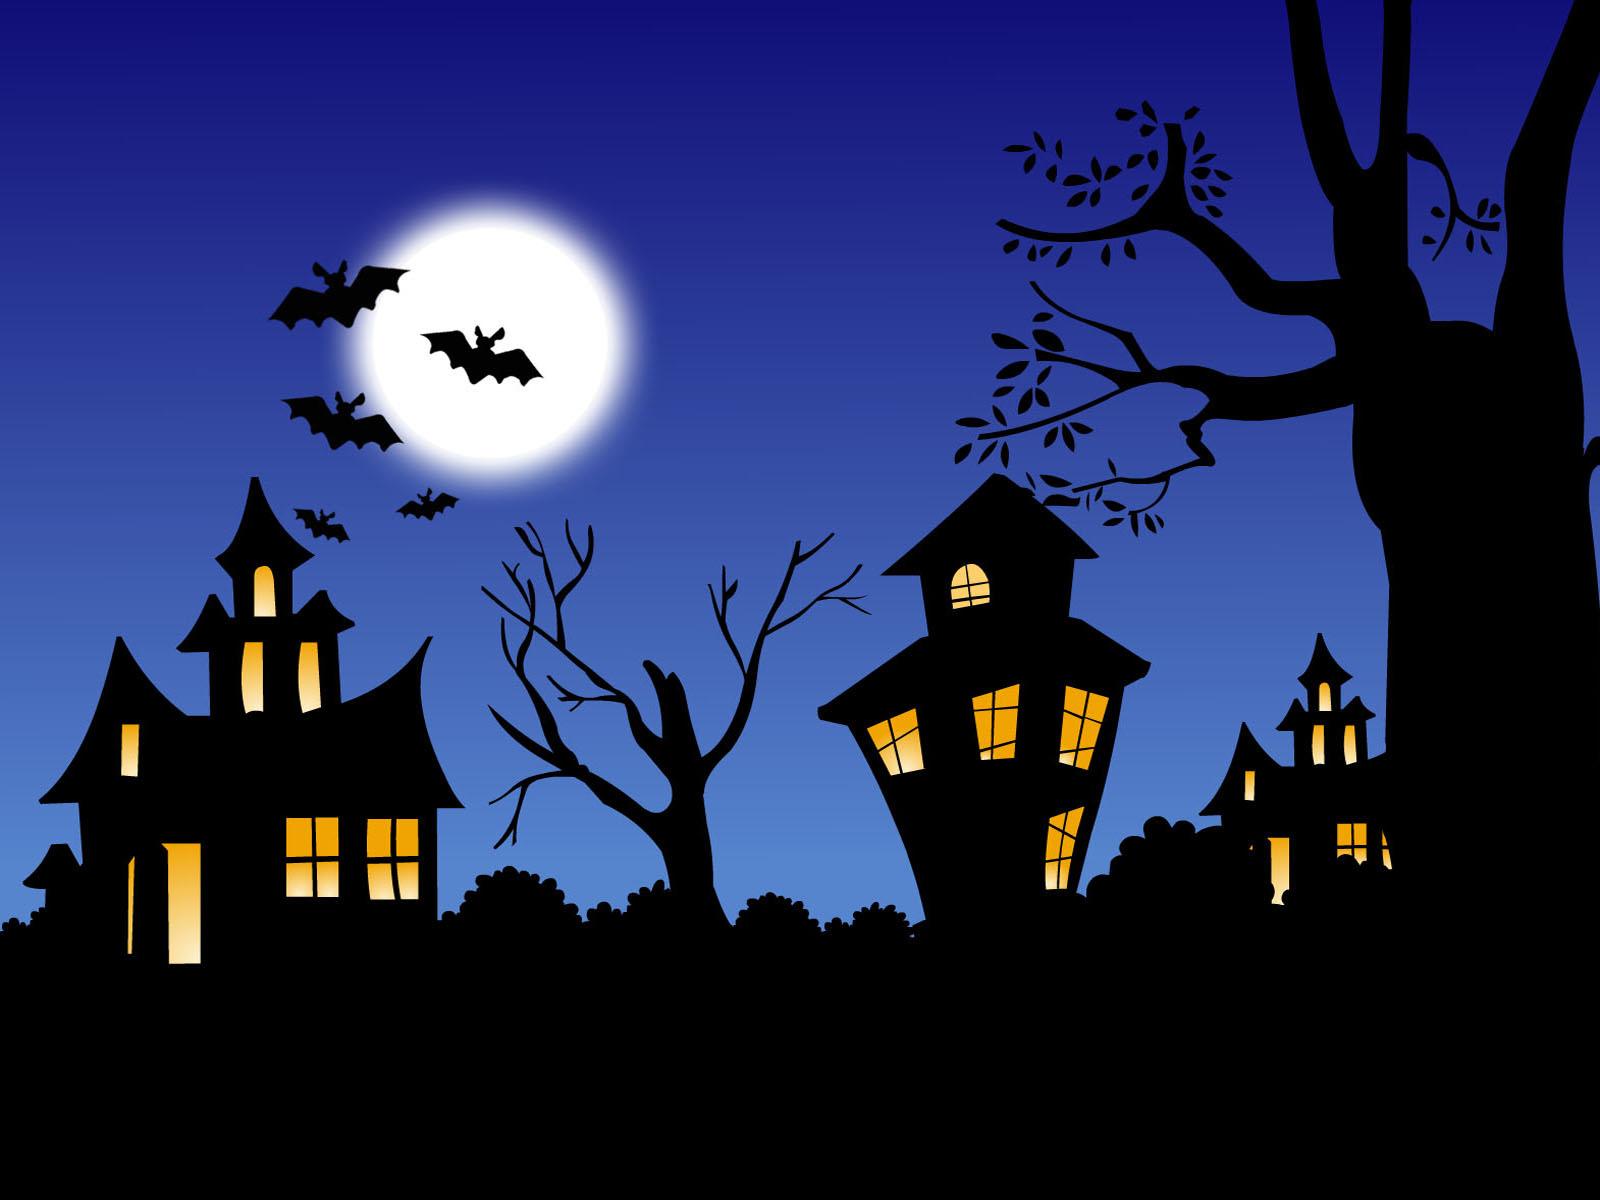 Halloween night wallpapers Halloween night stock photos 1600x1200